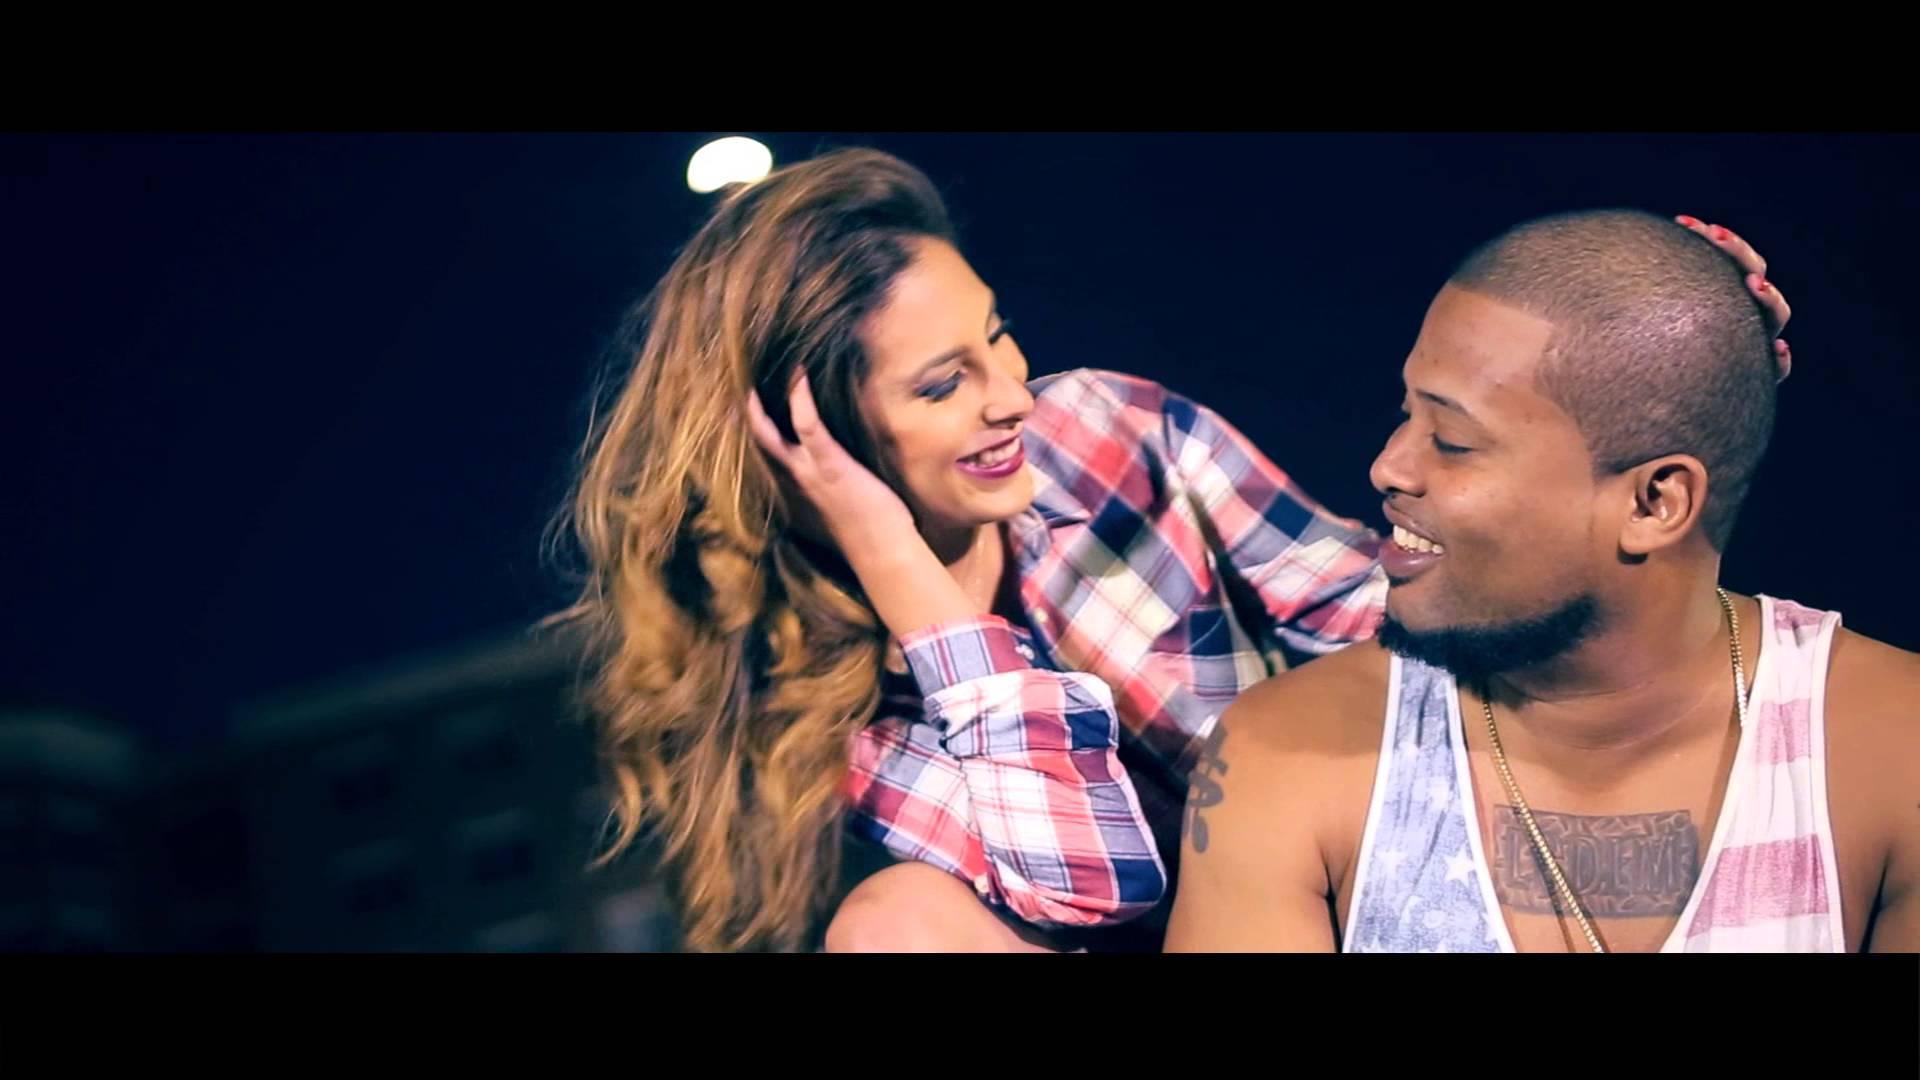 Lapiz Conciente – La Promesa (Official Video)